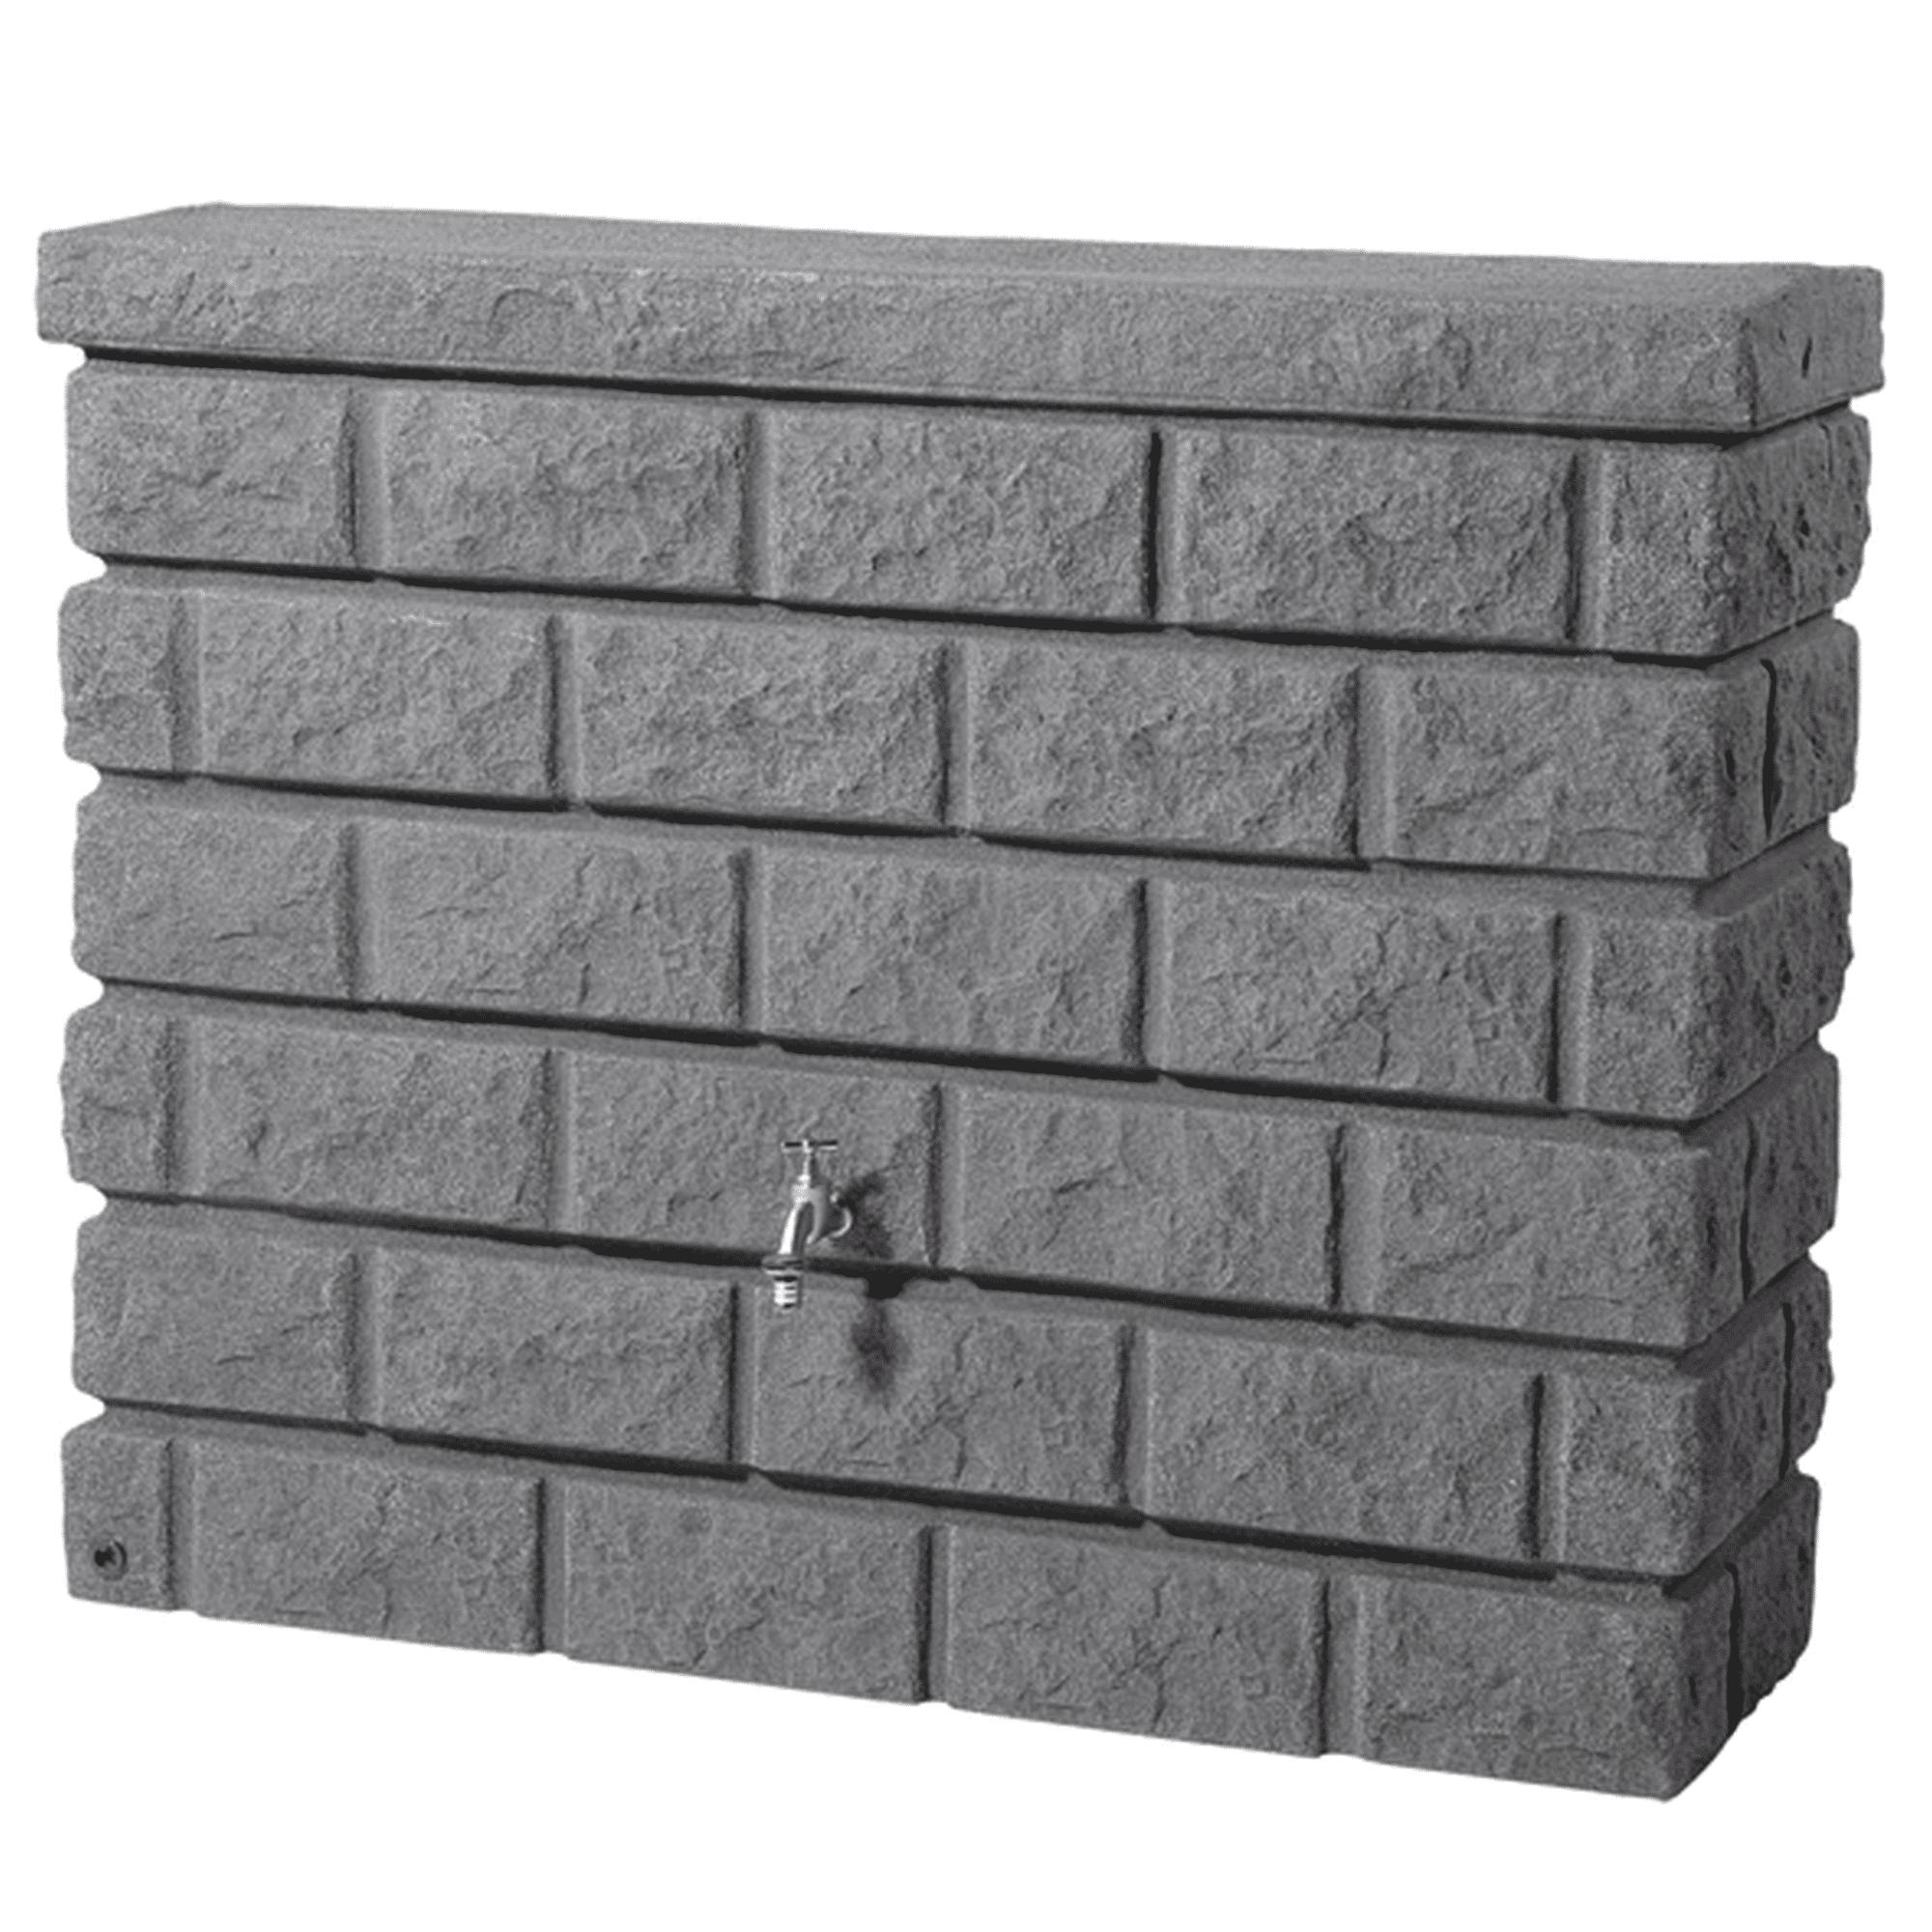 ROCKY Wandtank 400 L, Dark Granite